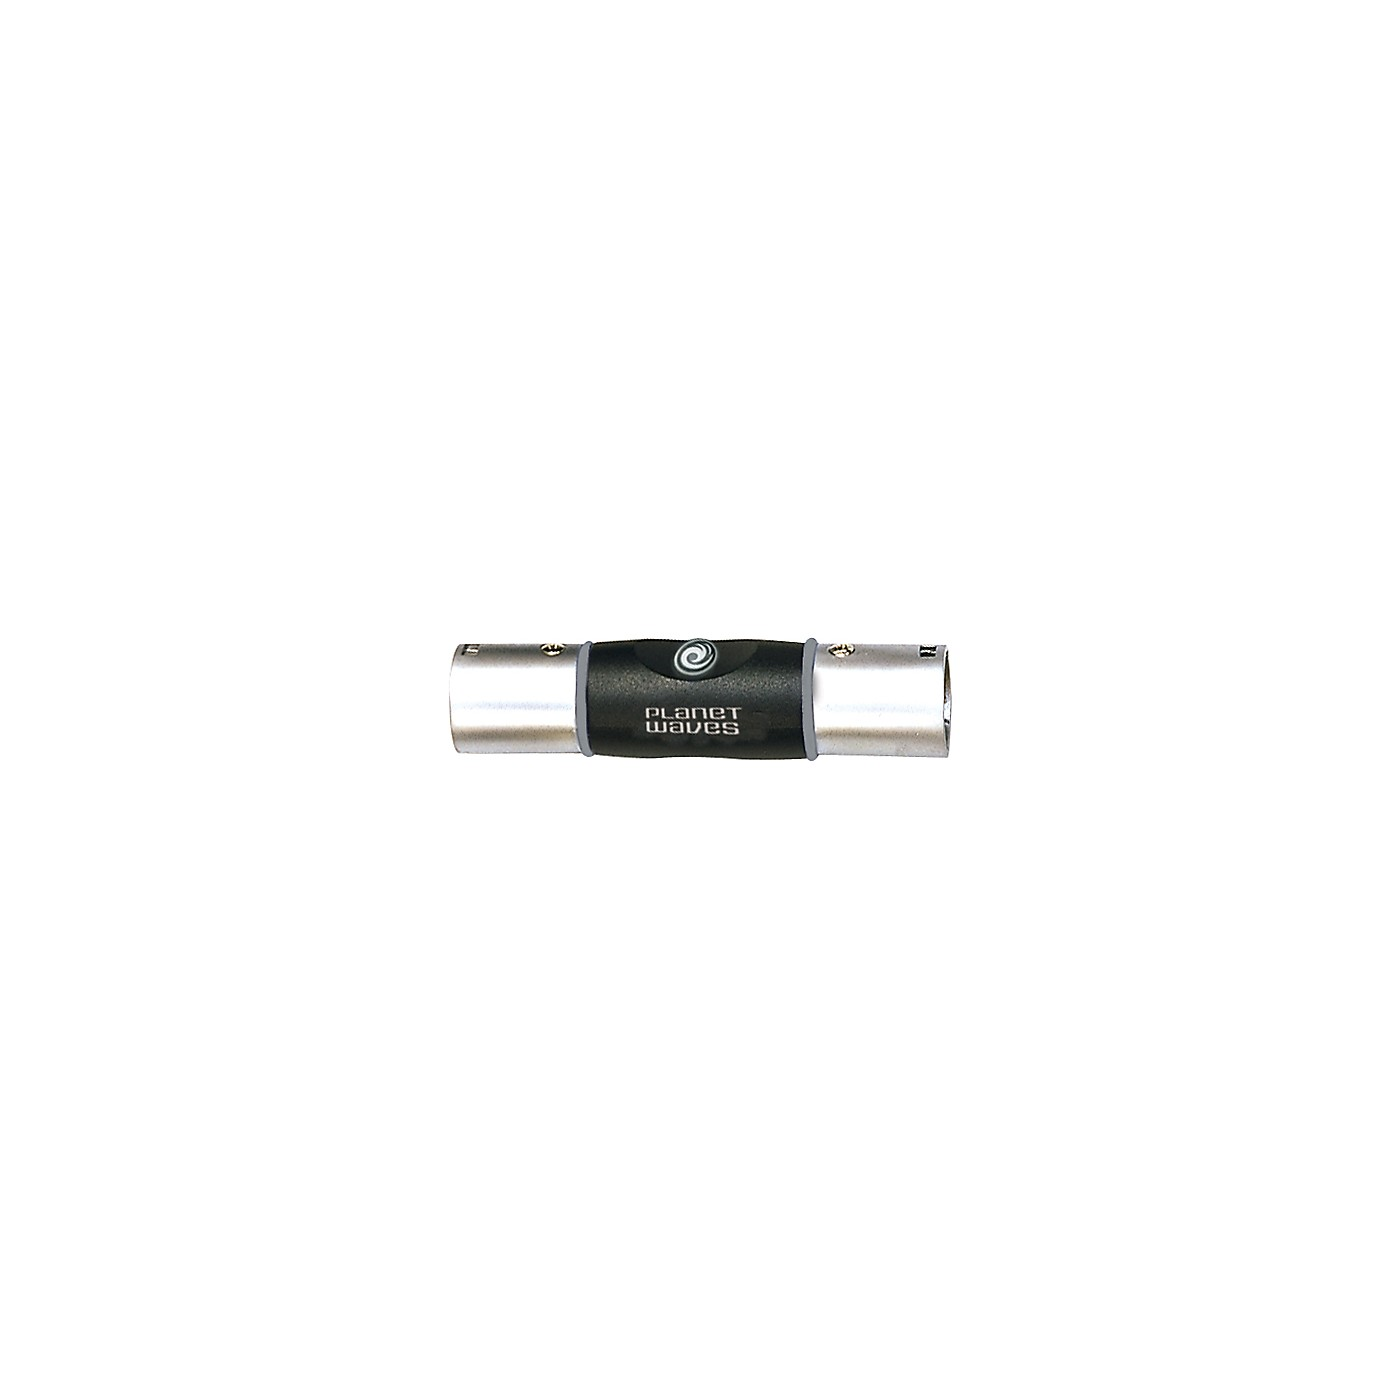 D'Addario Planet Waves XLR Male - XLR Male Adapter (metal shell) thumbnail